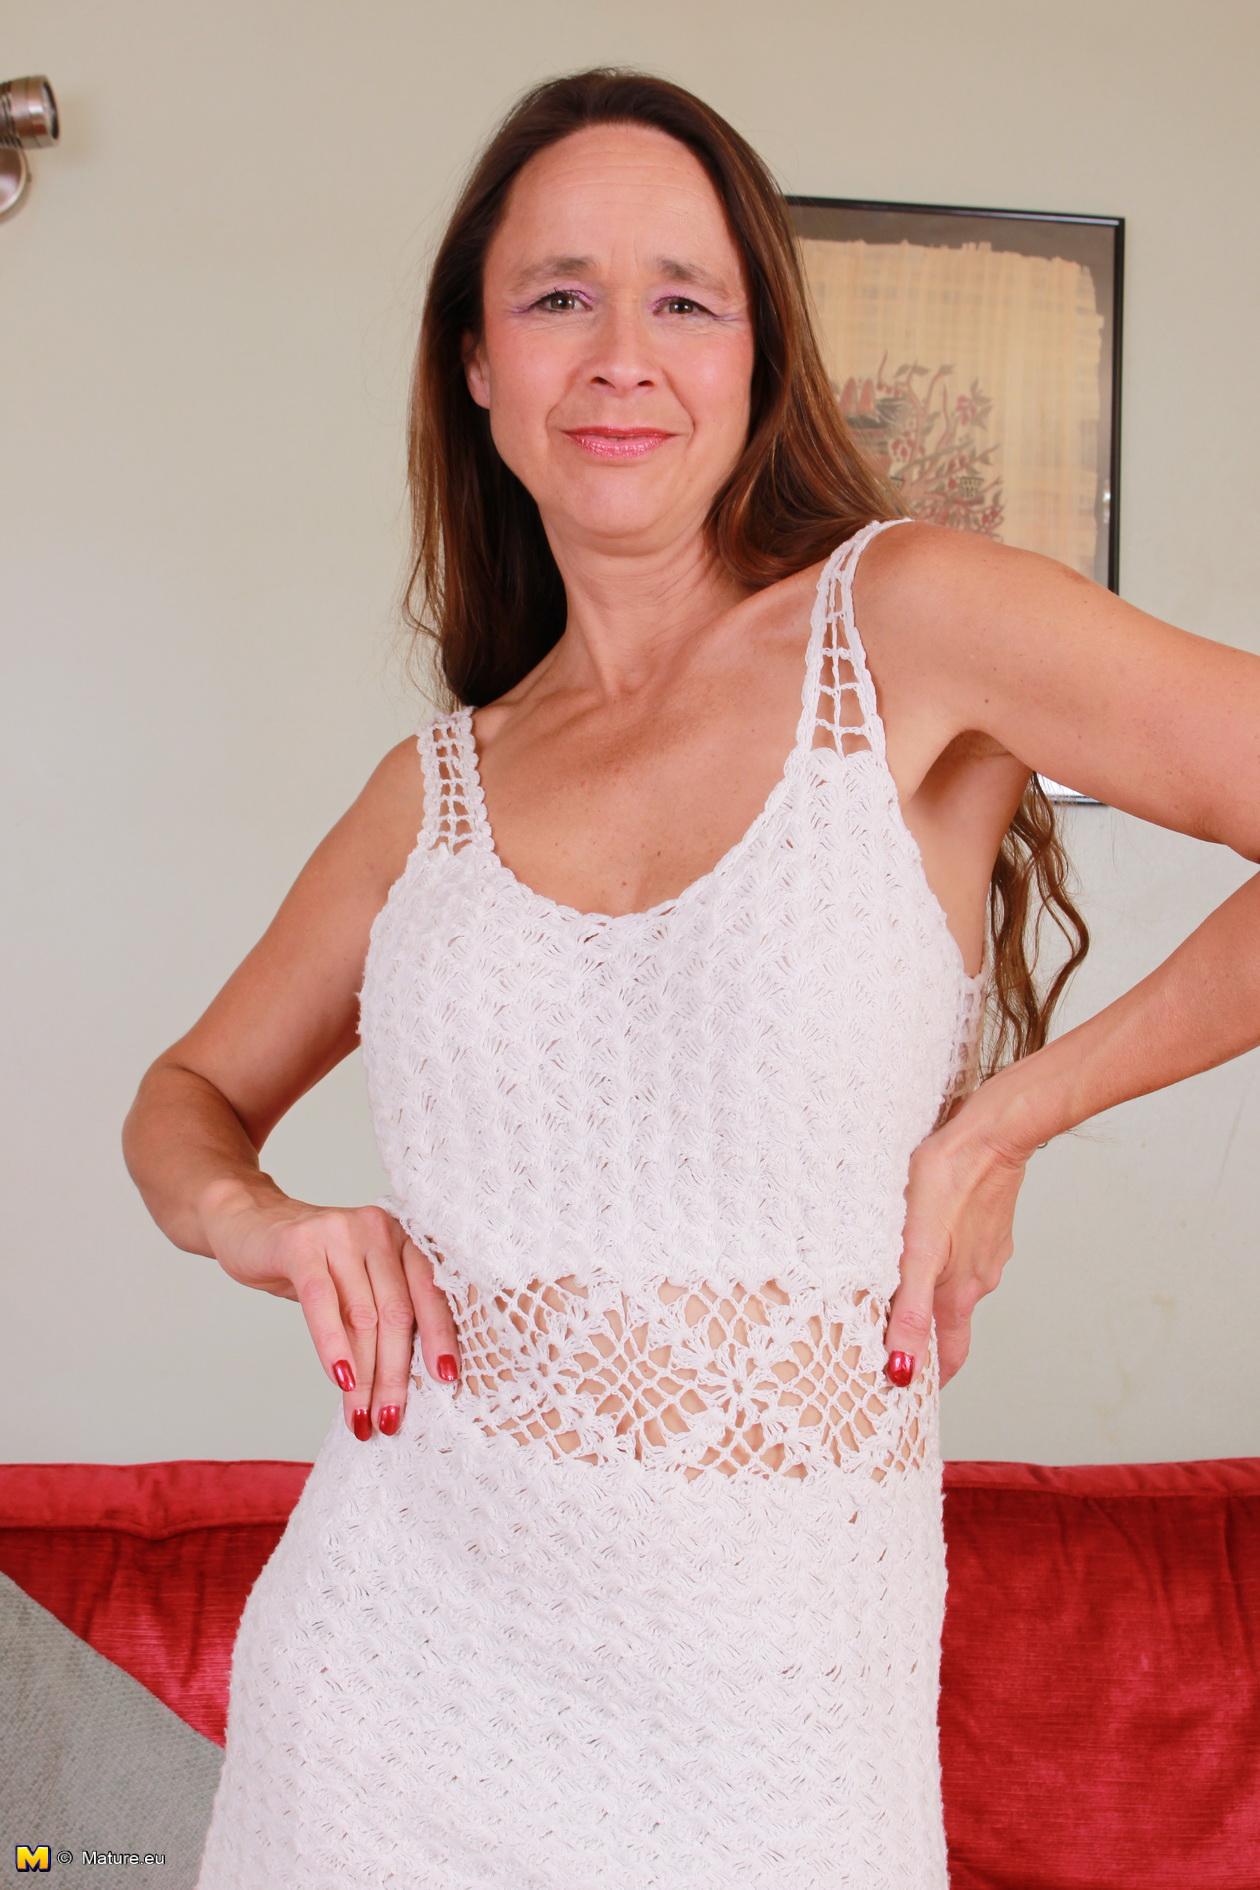 Gabrielle sunheart nude